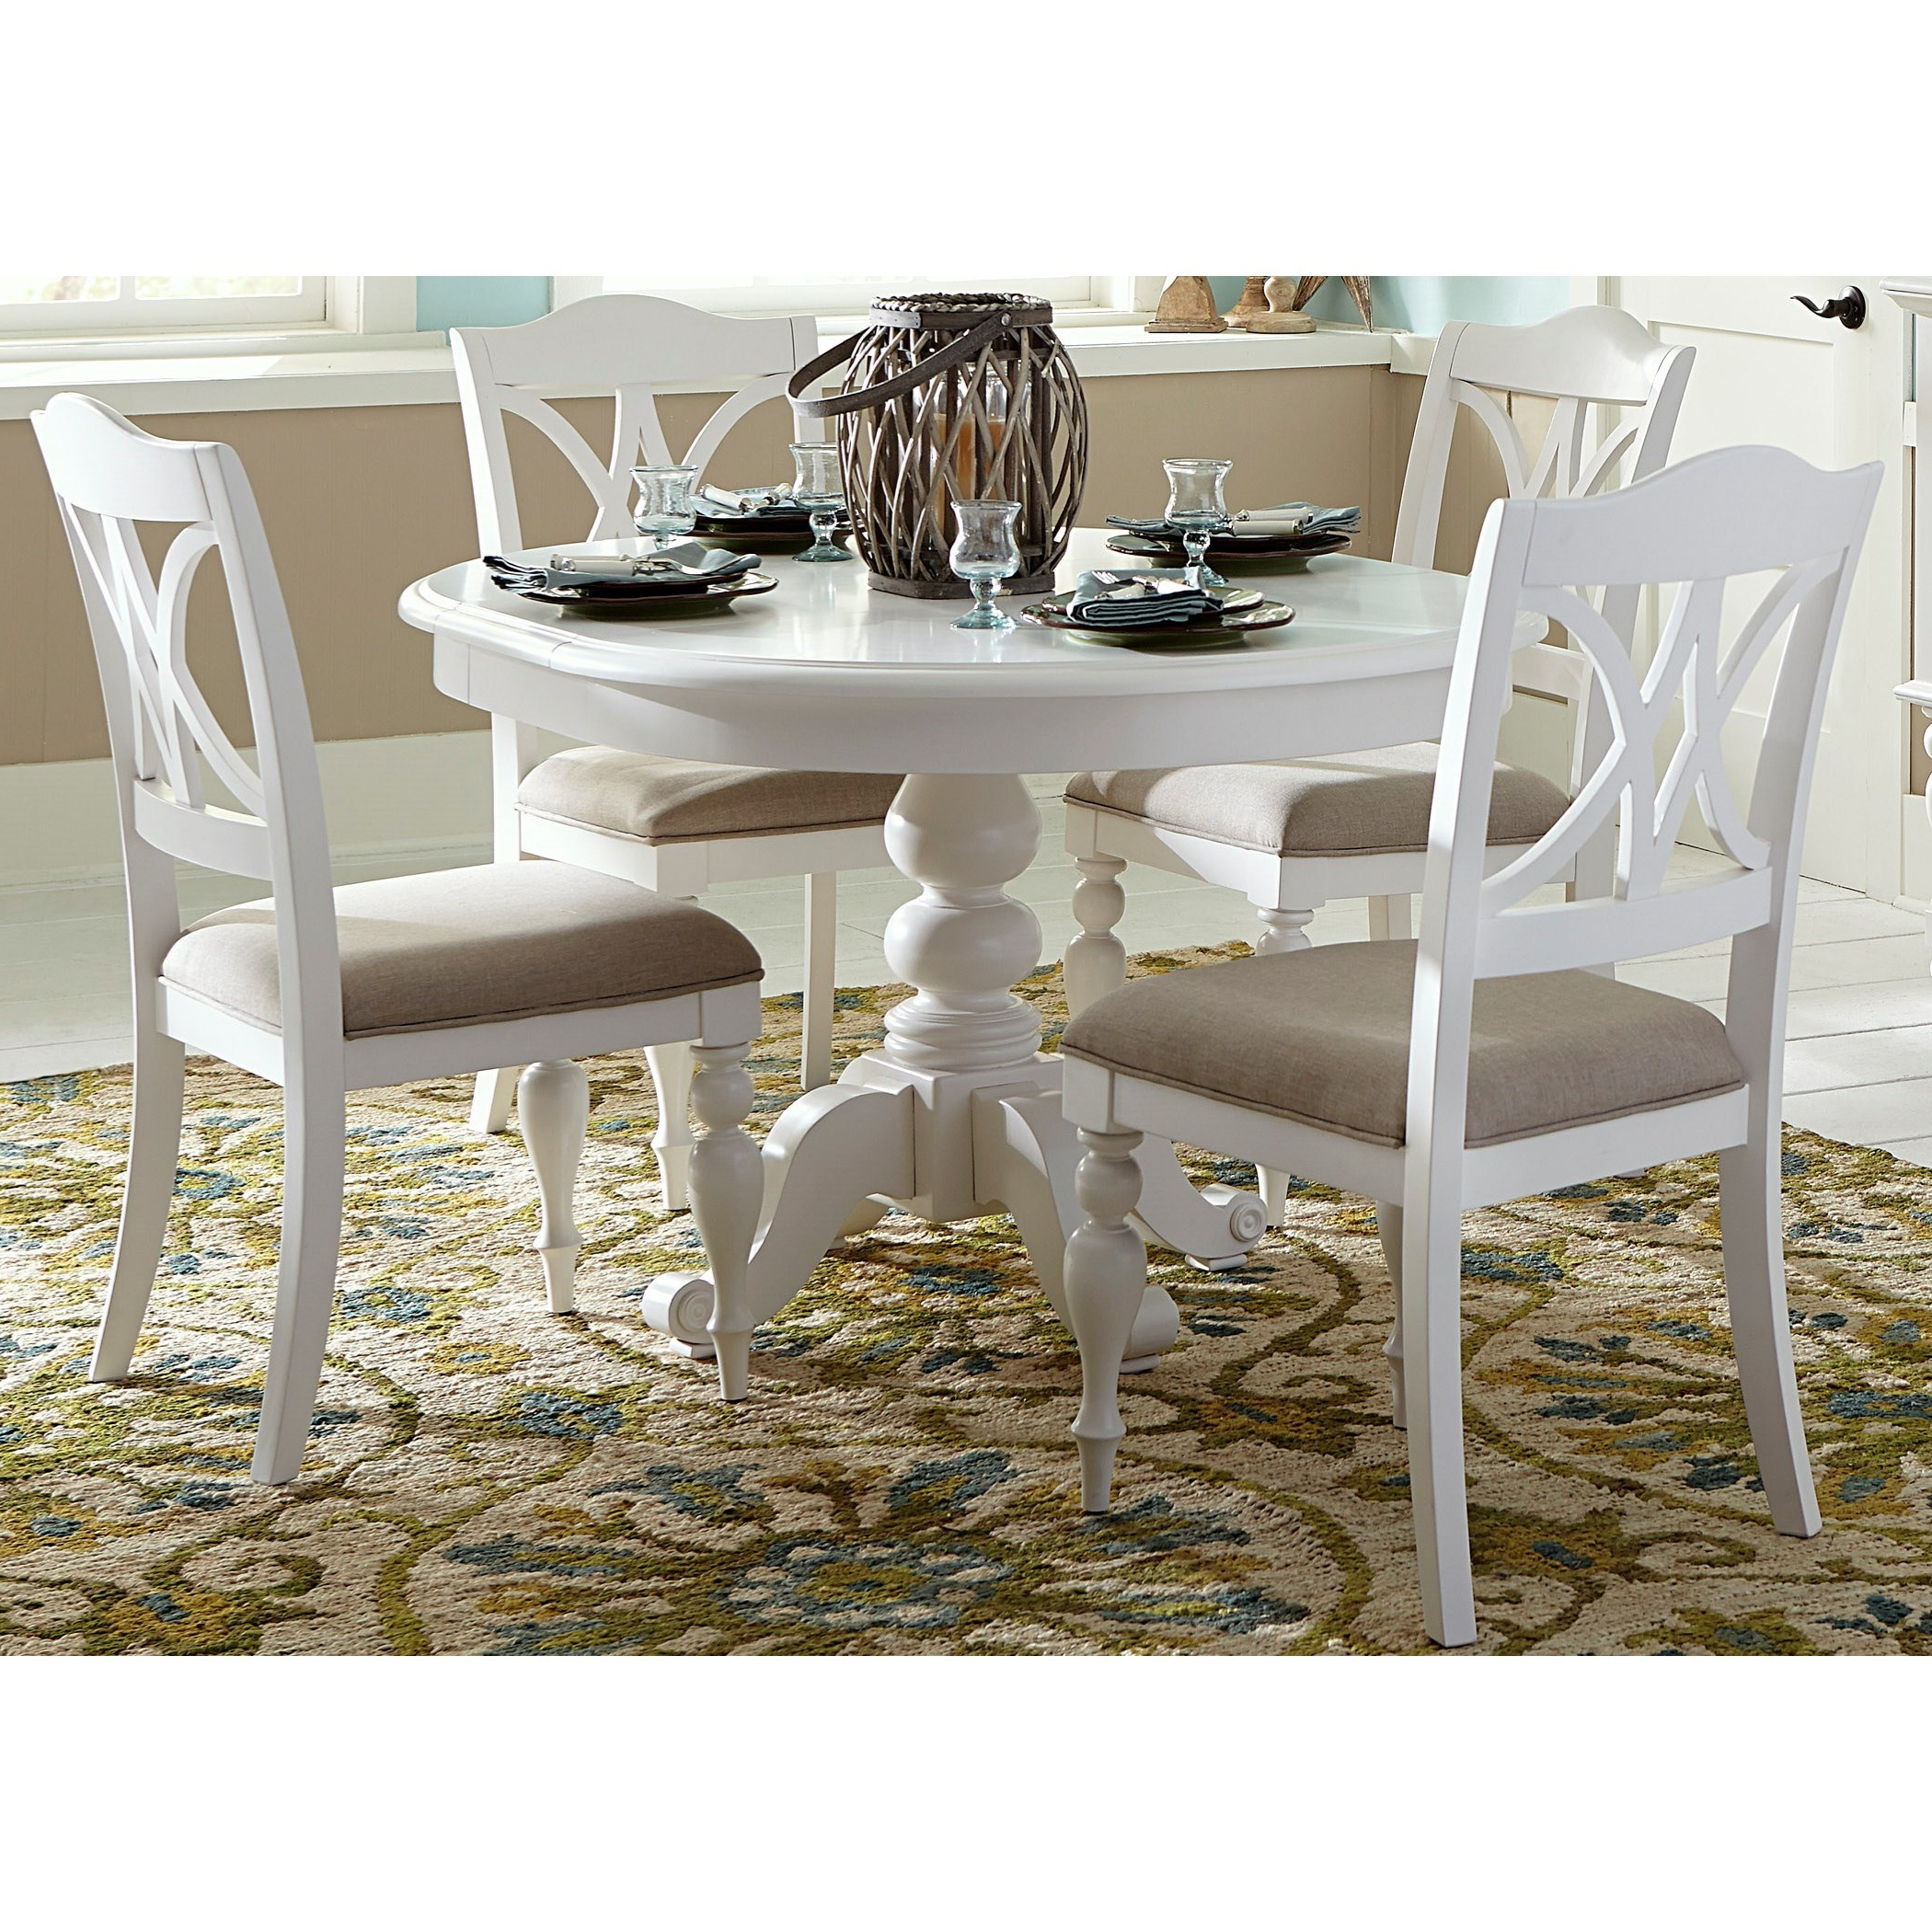 Sarah Randolph Designs Summer House I 5 Piece Pedestal For Most Popular Villani Pedestal Dining Tables (View 15 of 20)